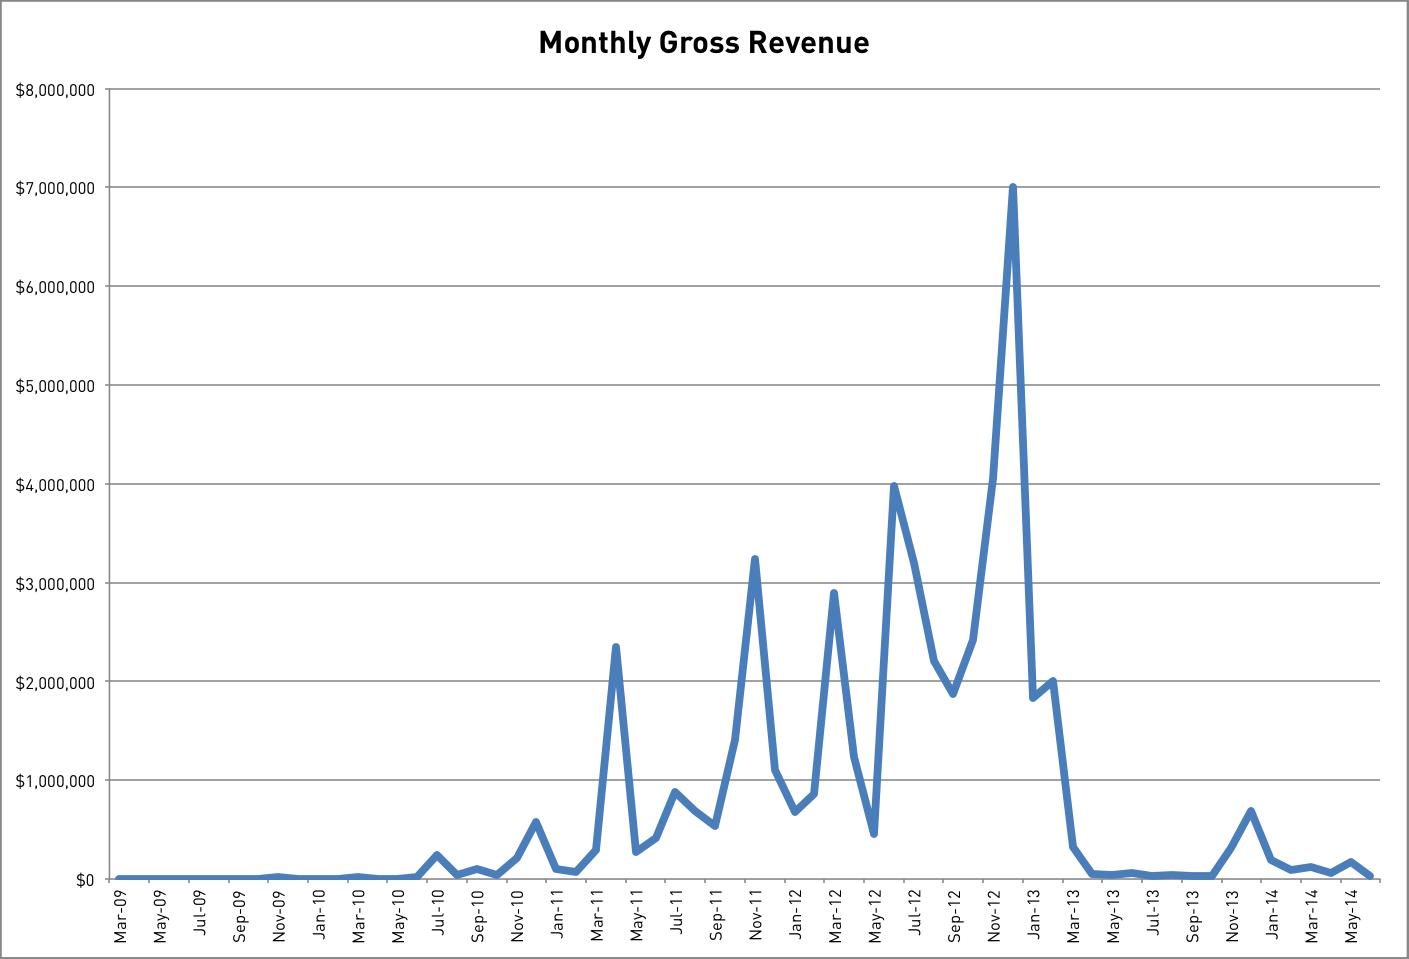 Monthly Gross Revenue